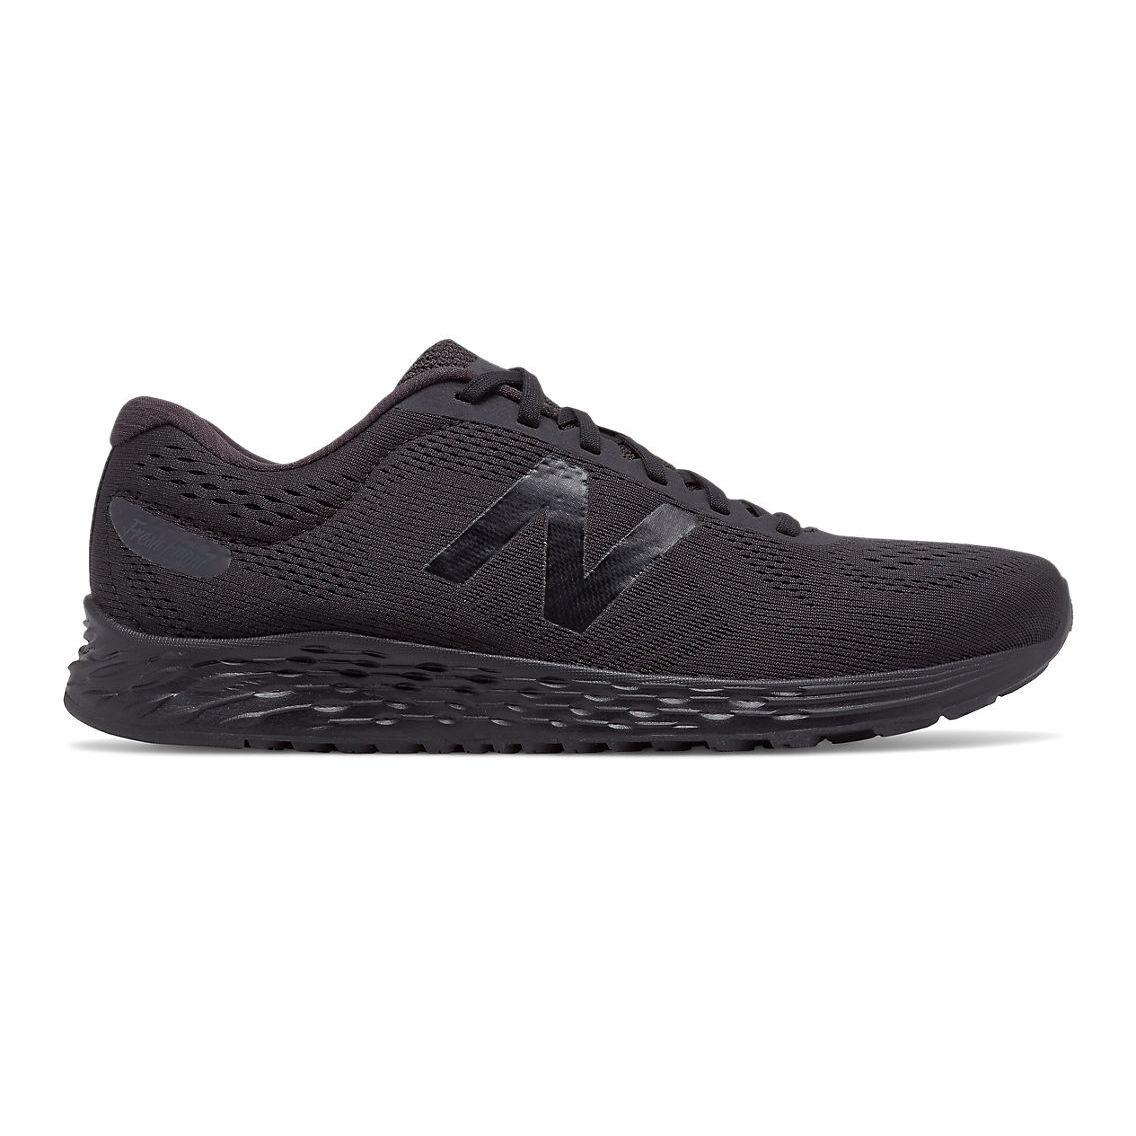 acheter en ligne da399 004ae Chaussures New Balance Fresh Foam Arishi